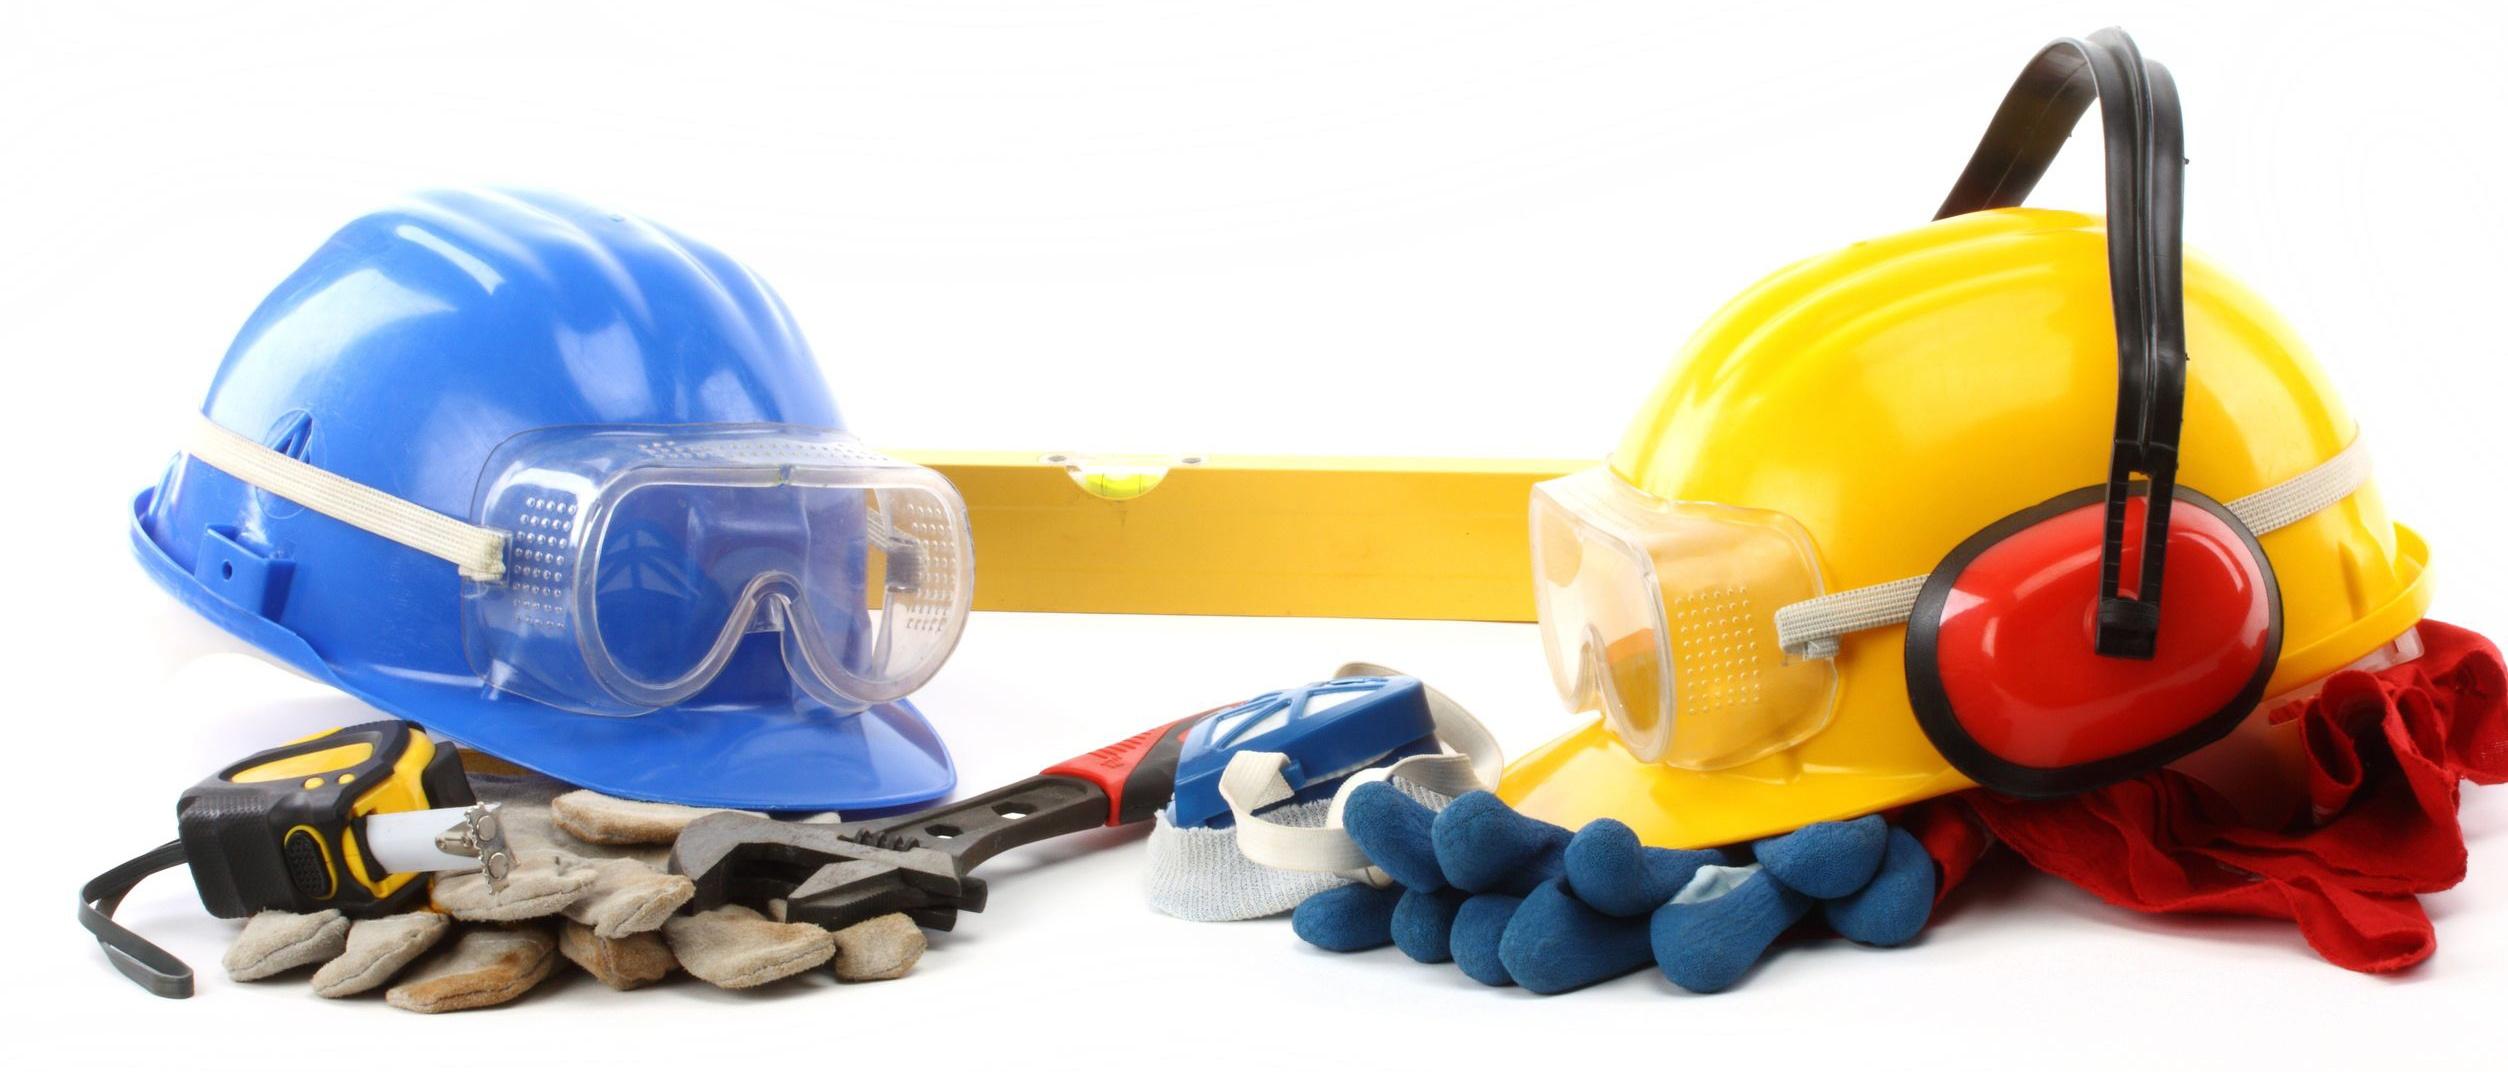 echipamente protectie vaslui